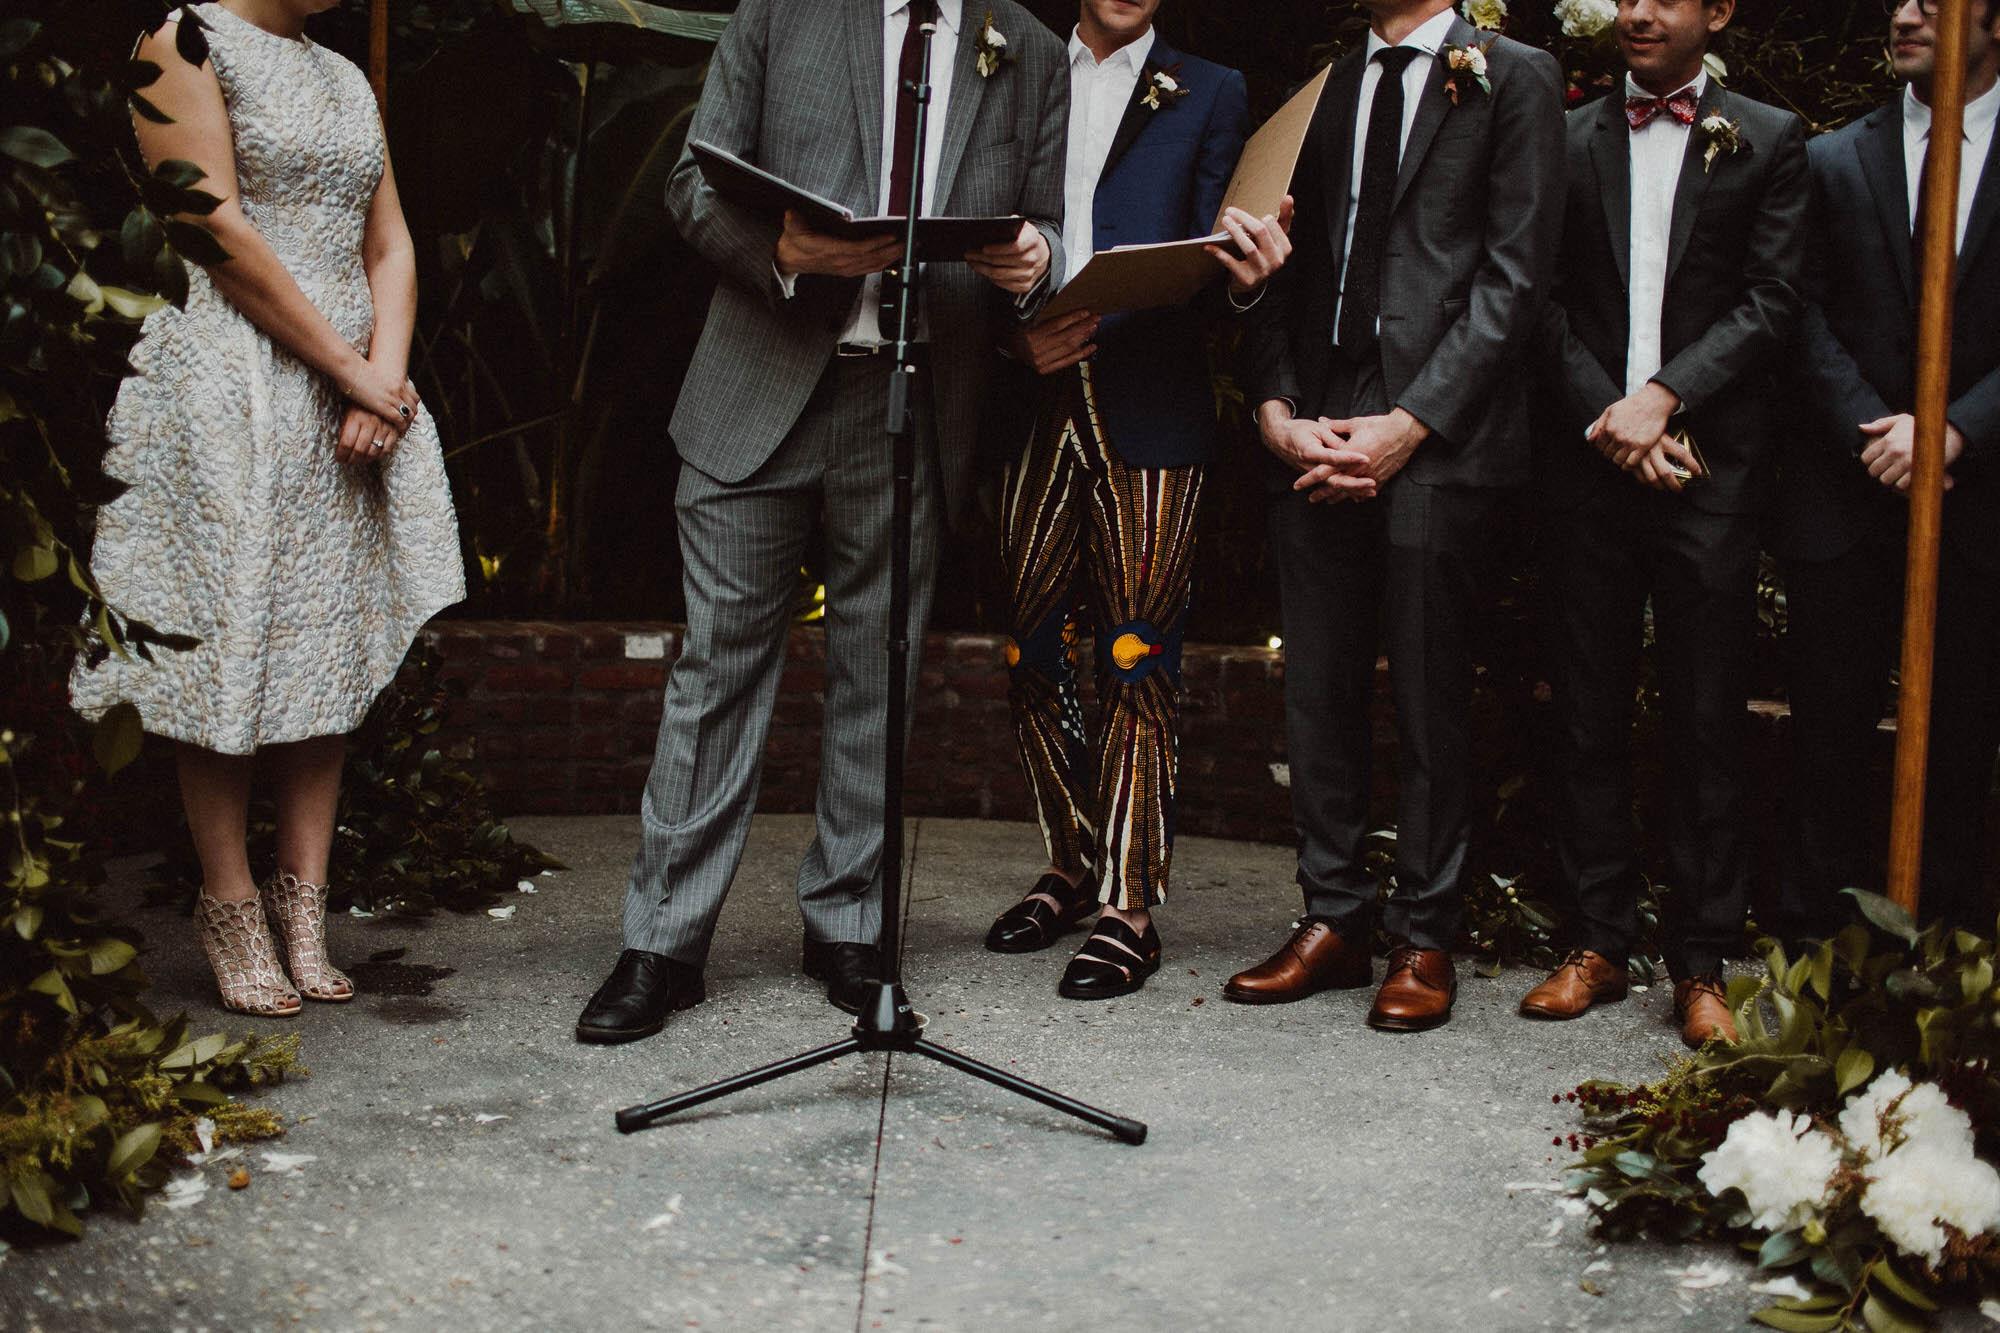 los-angeles-wedding-photographer-millwick-102.jpg